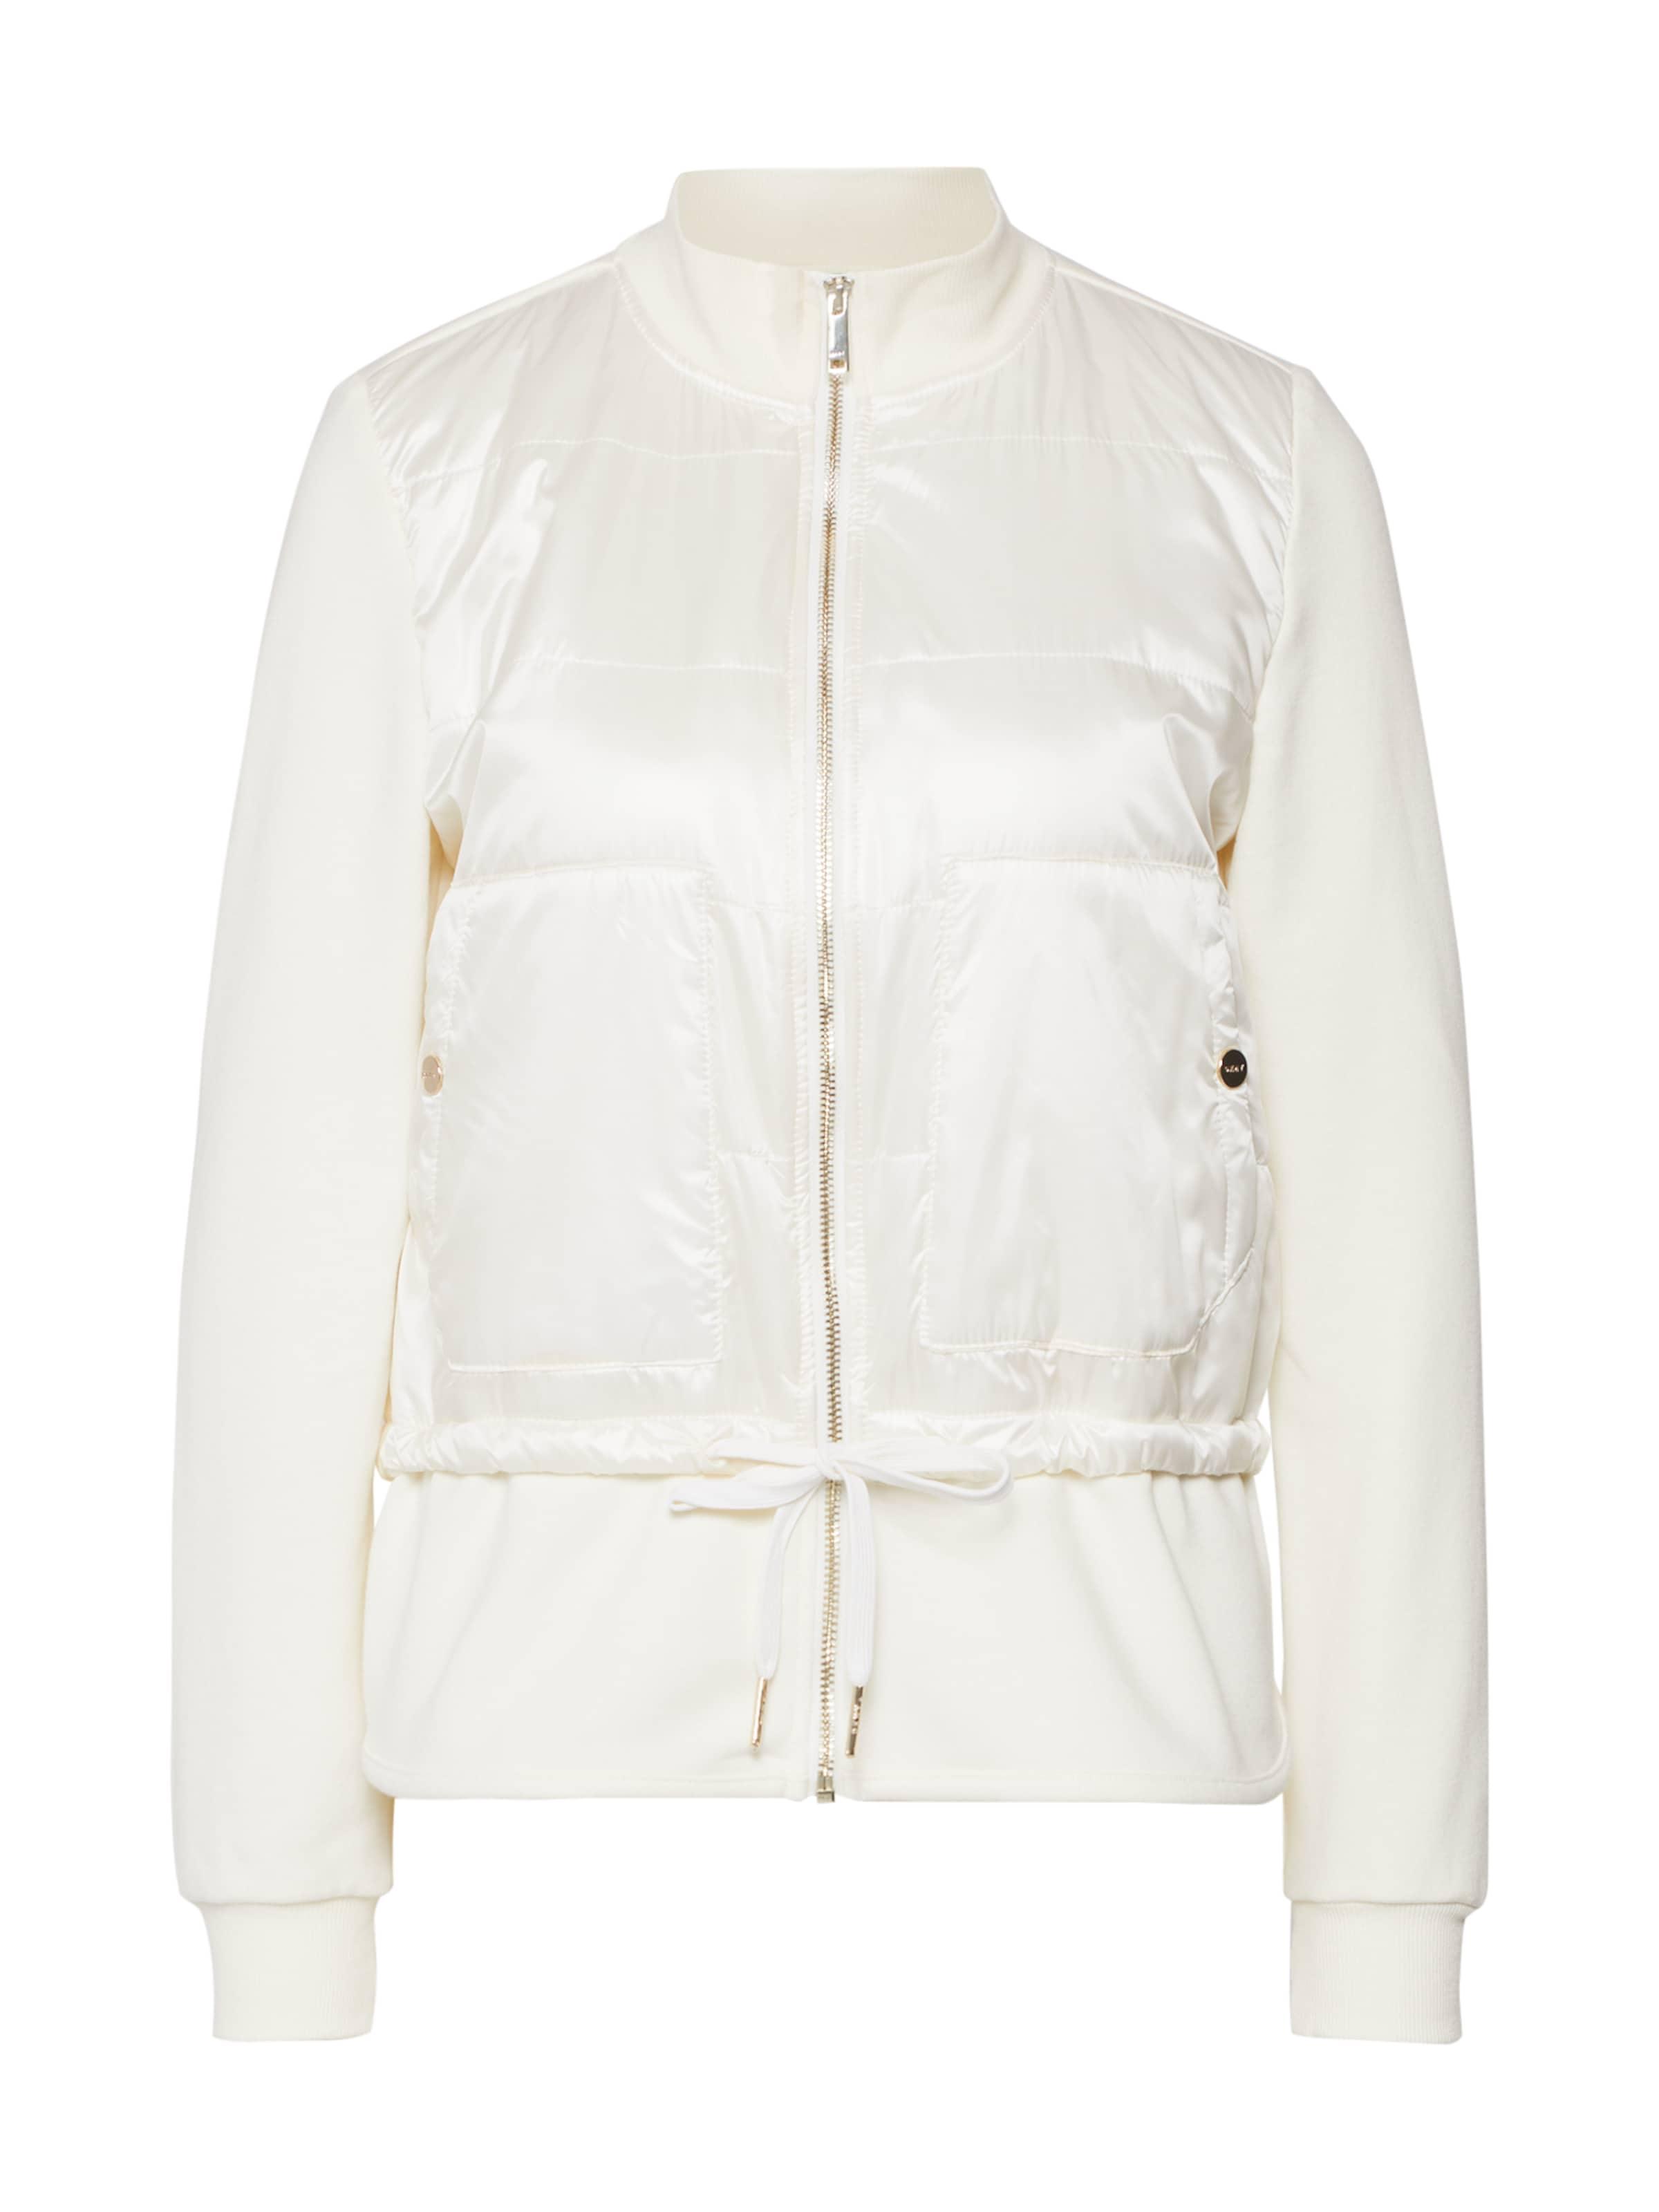 Dkny Fabric' Beige Survêtement En Blanc De 'combo Veste ITYraWzqI